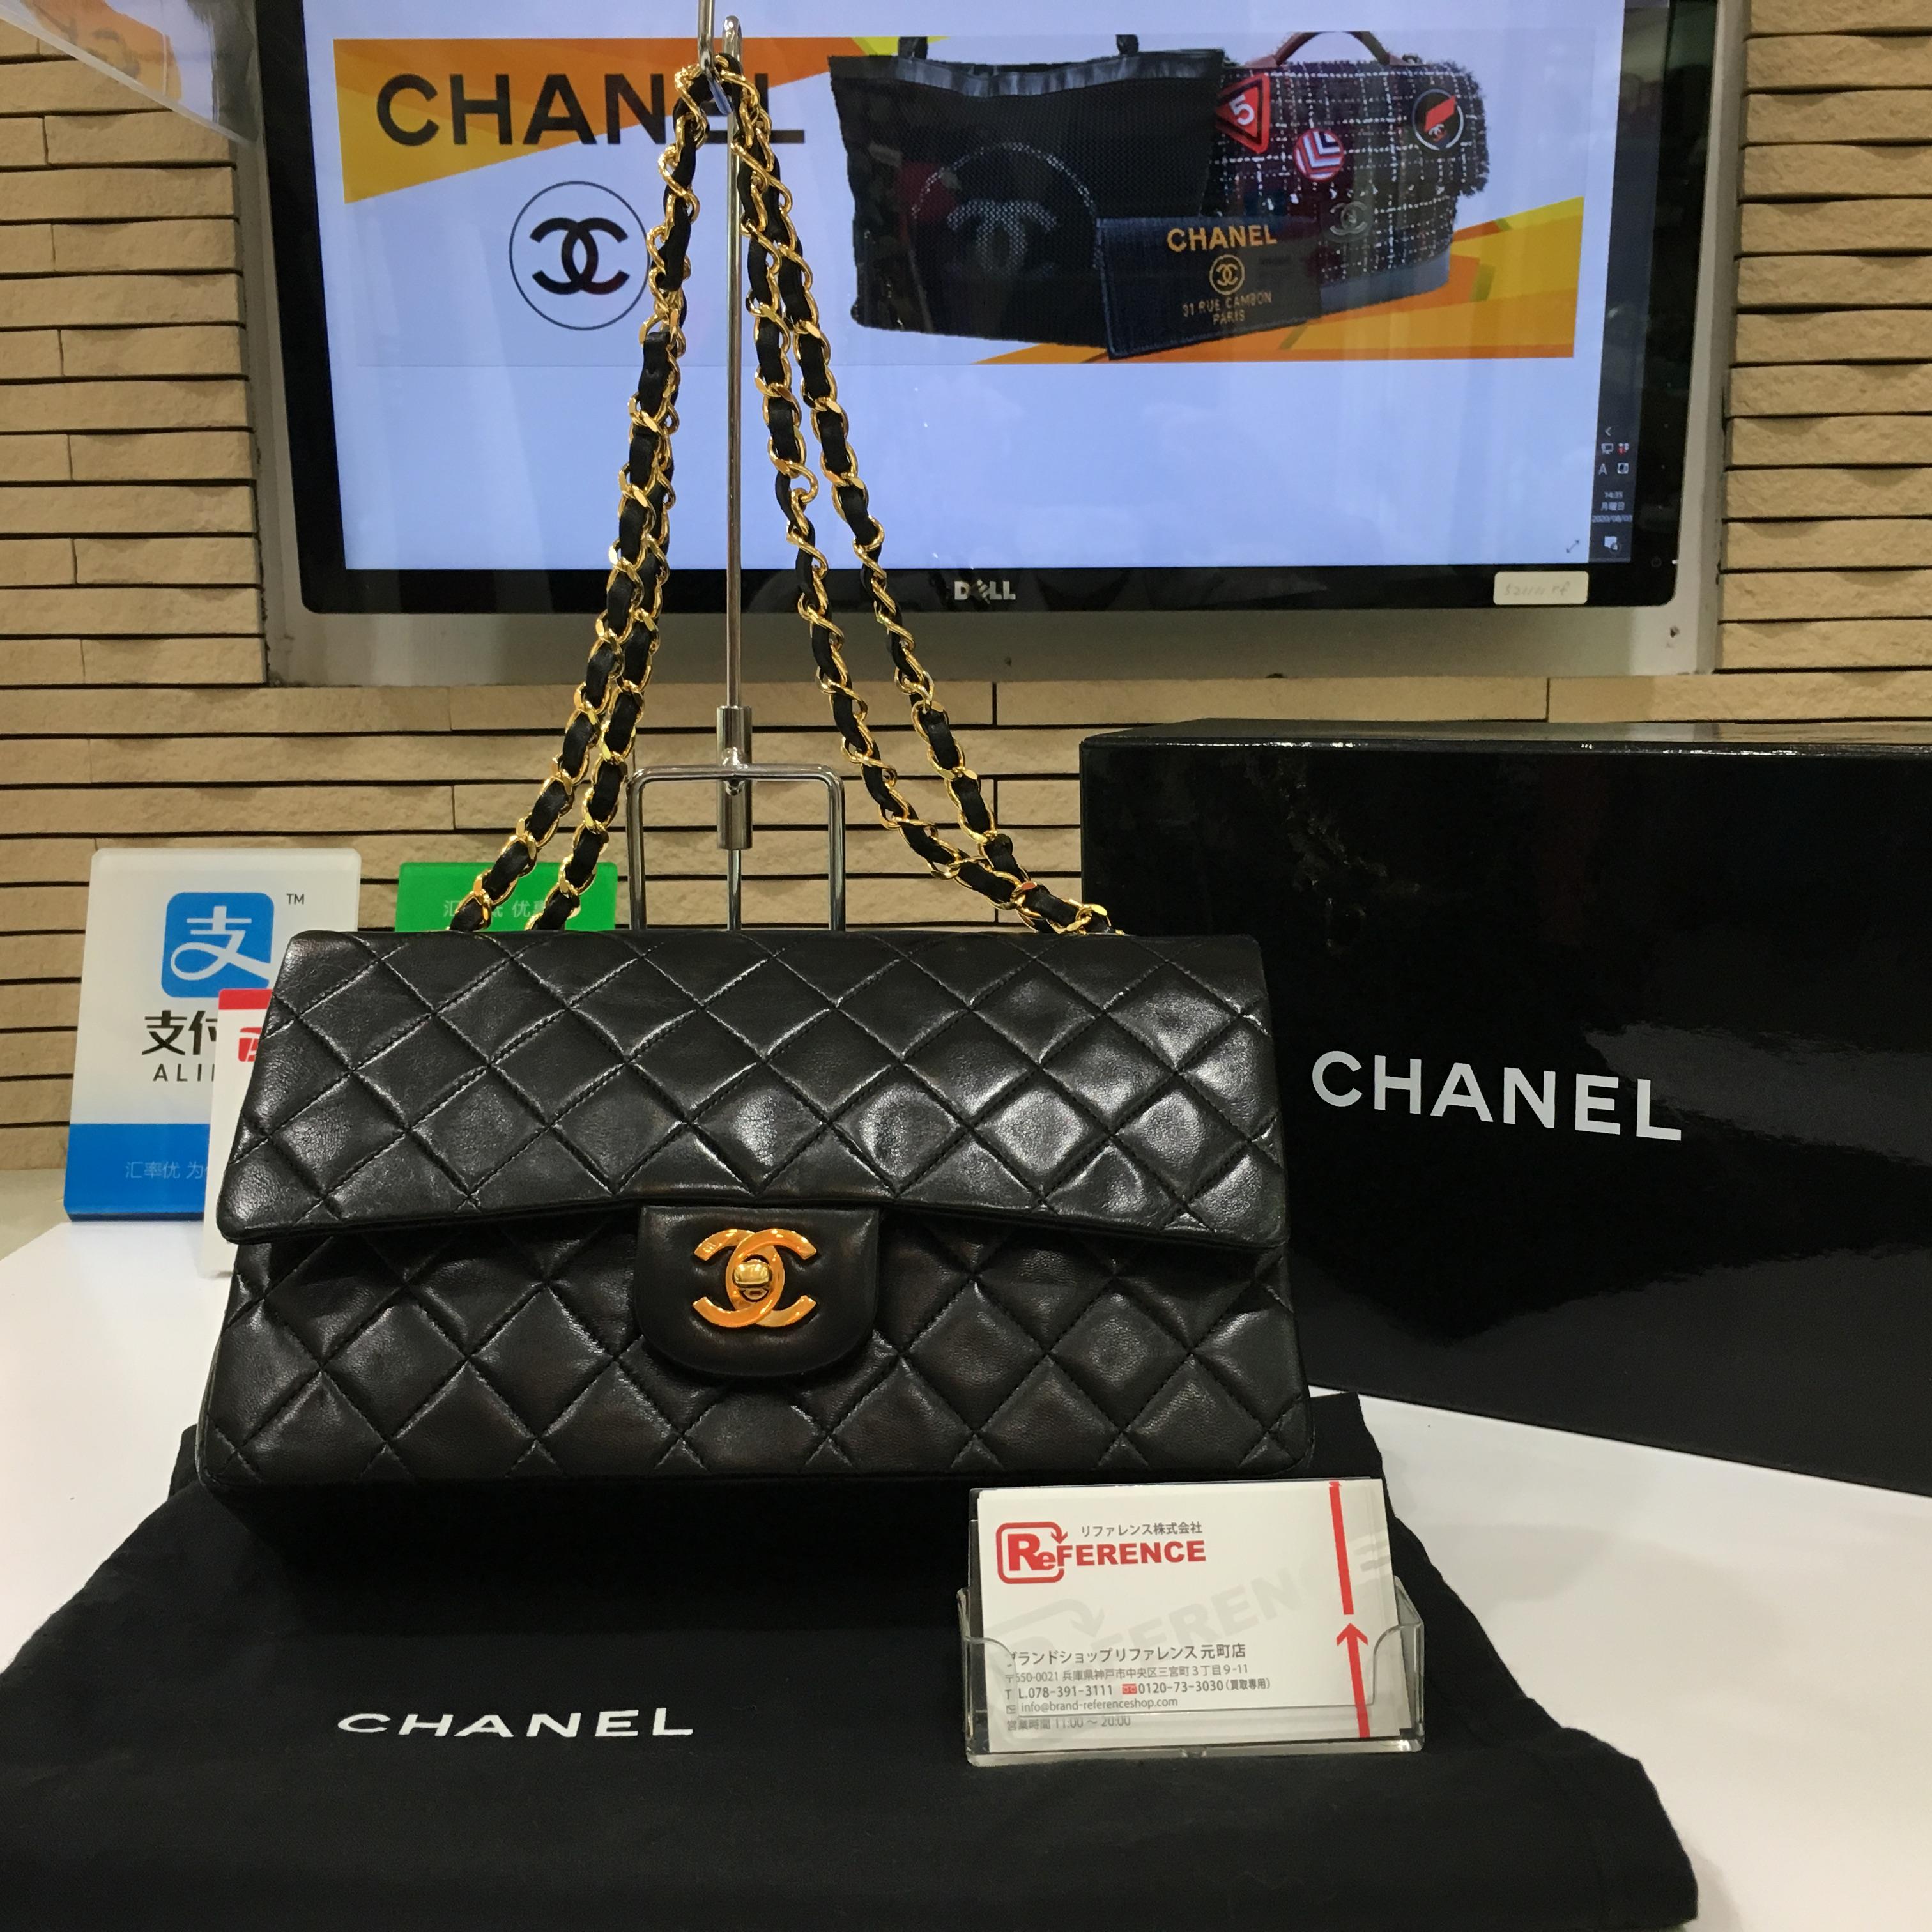 CHANEL🌸シャネルのマトラッセ25【型番:A01112】Wチェーンショルダーバッグを高価買取👜